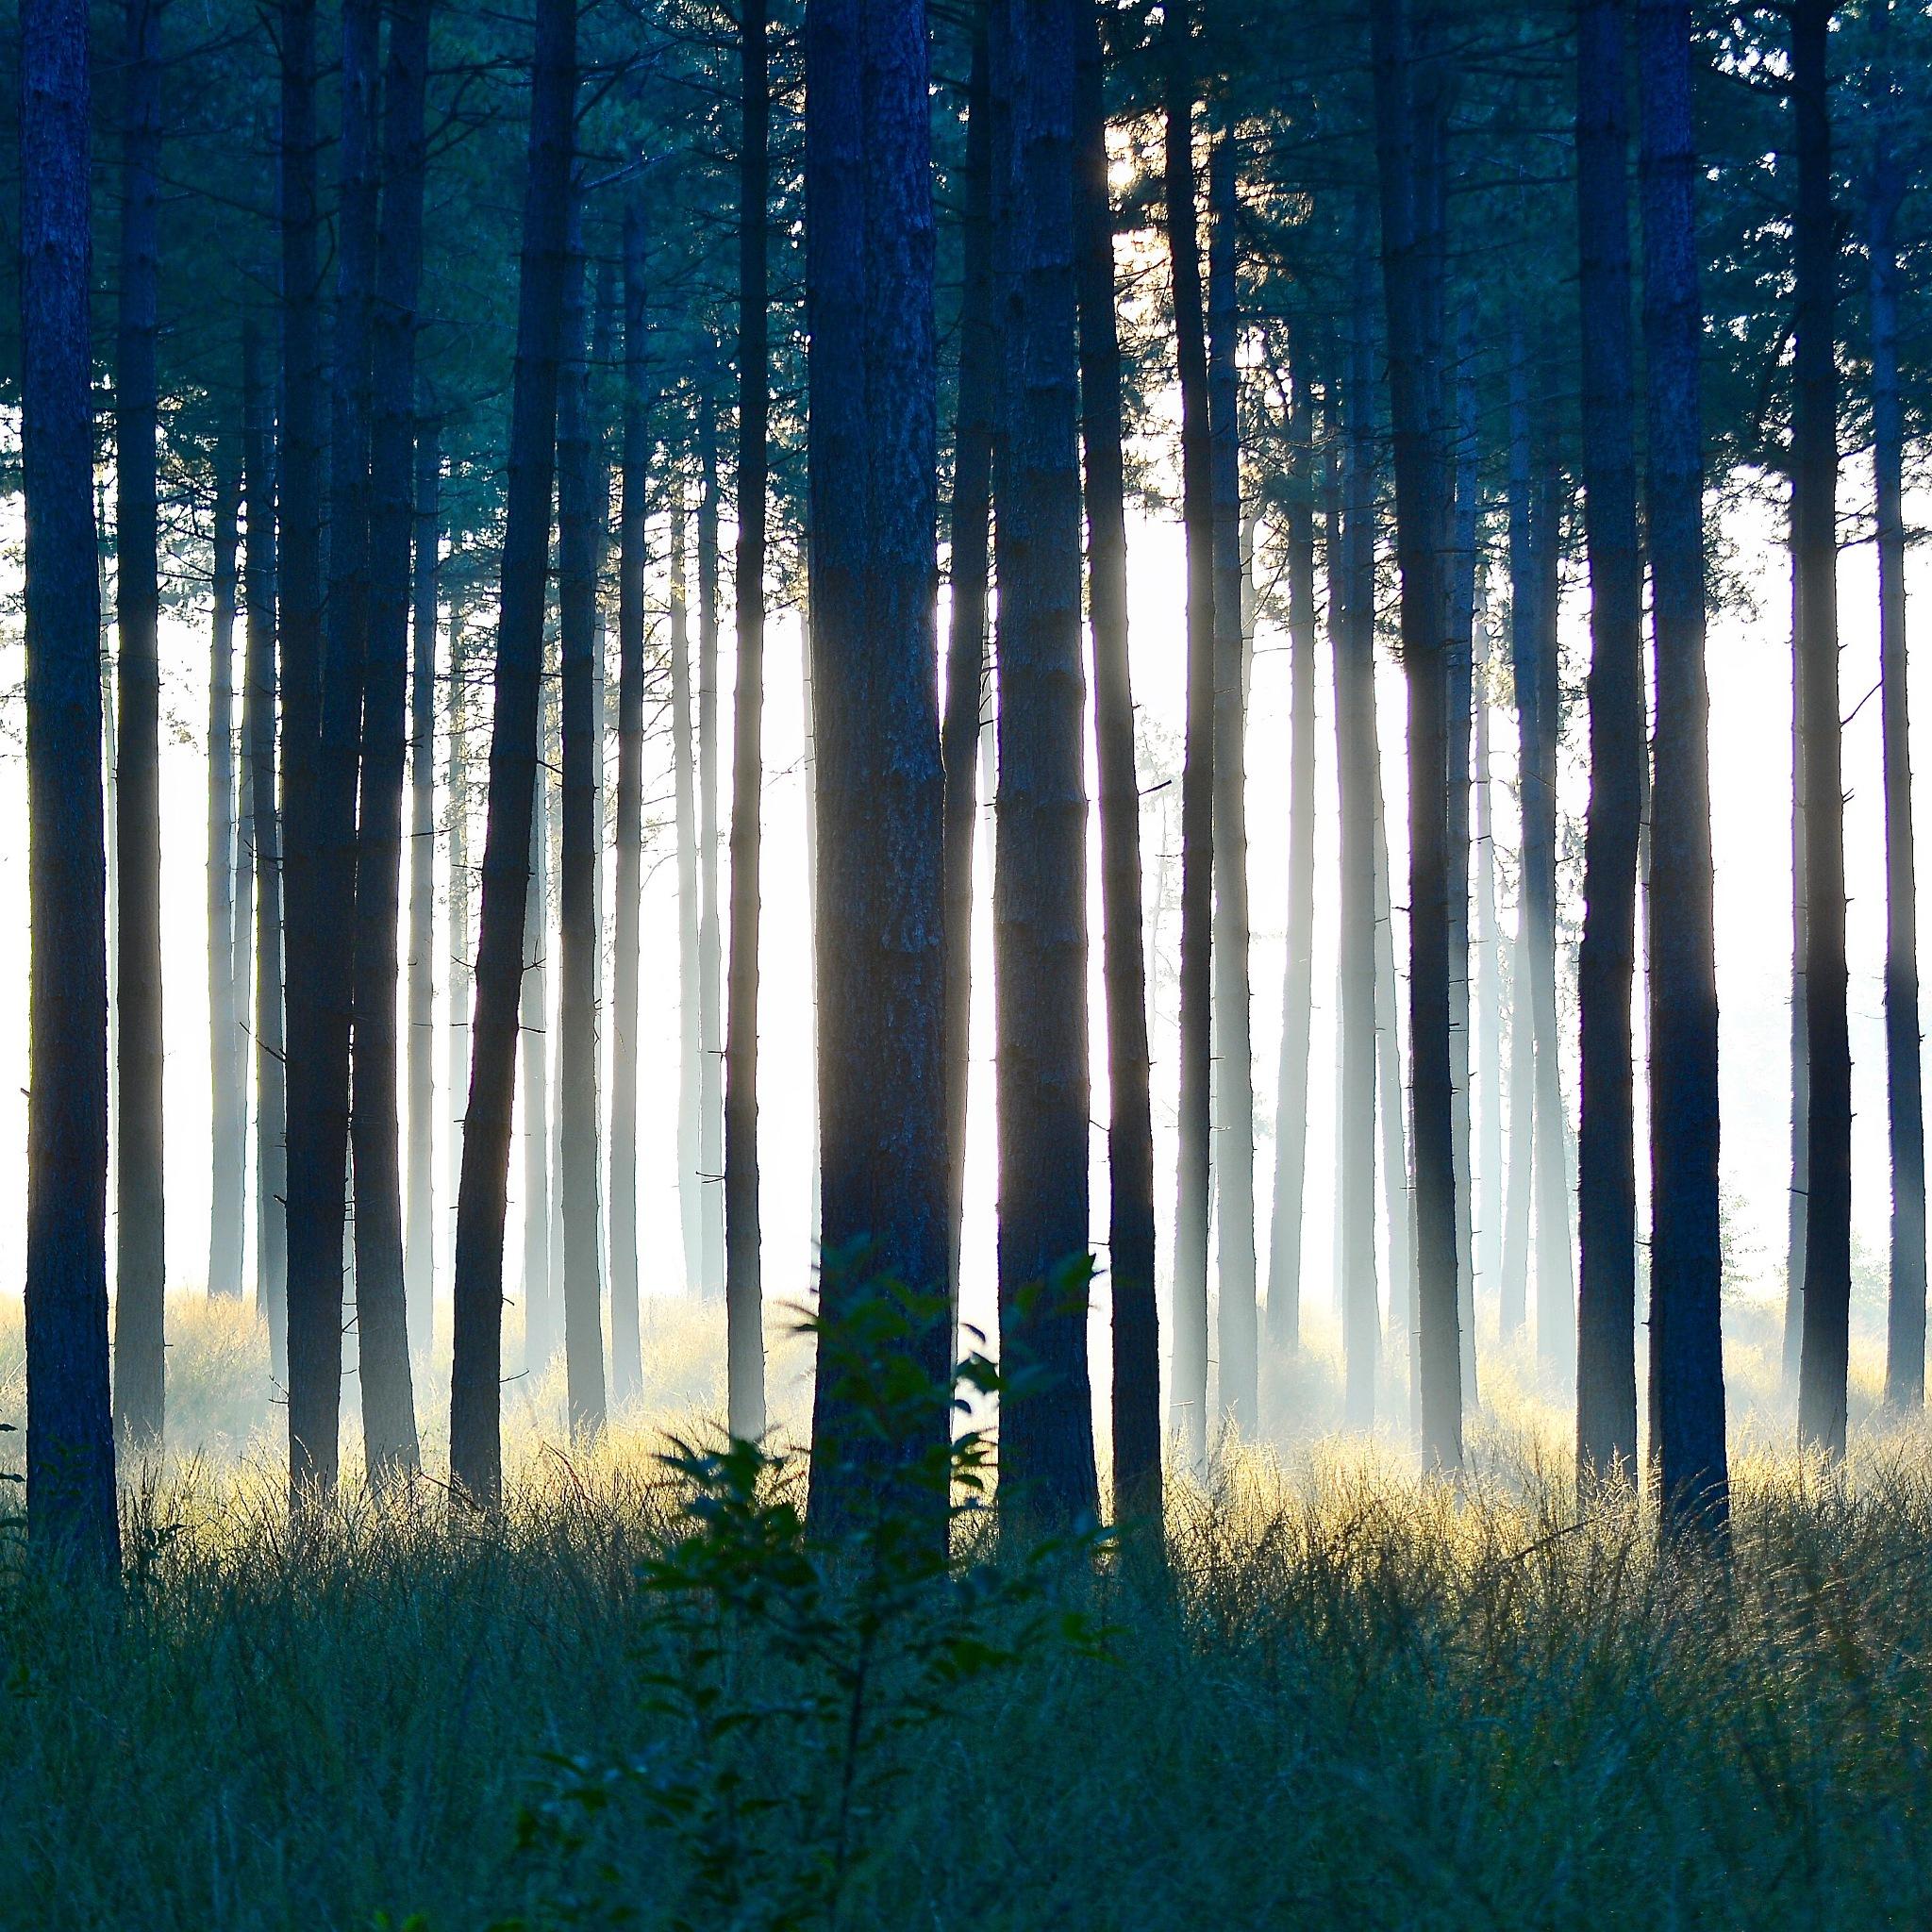 Foggy forest by toinelenssen